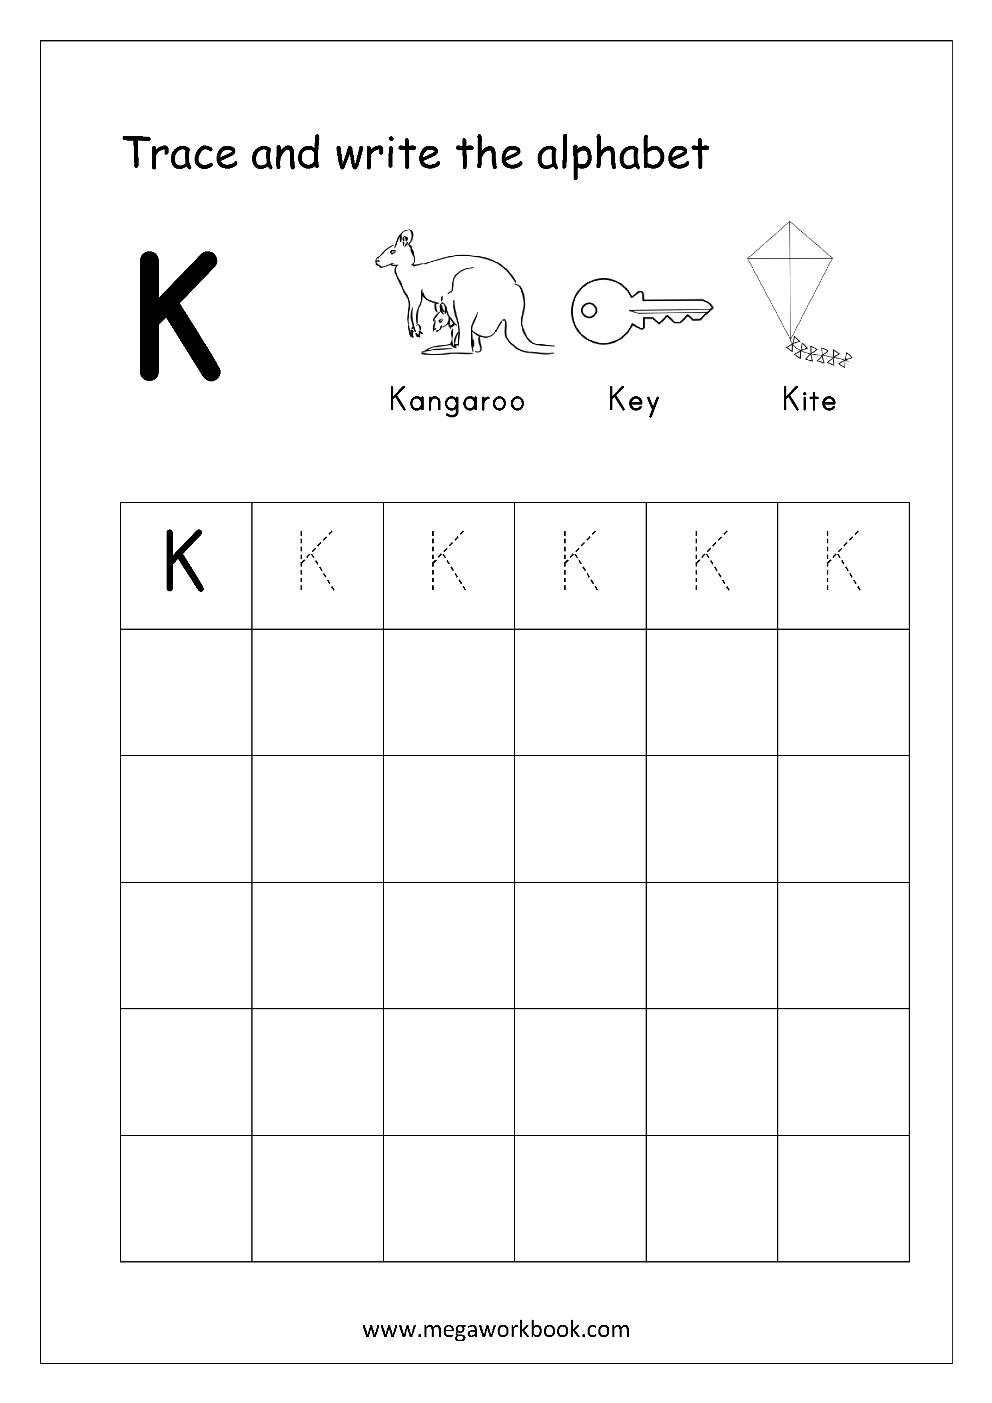 free english worksheets alphabet writing capital letters letter tracing writing megaworkbook. Black Bedroom Furniture Sets. Home Design Ideas